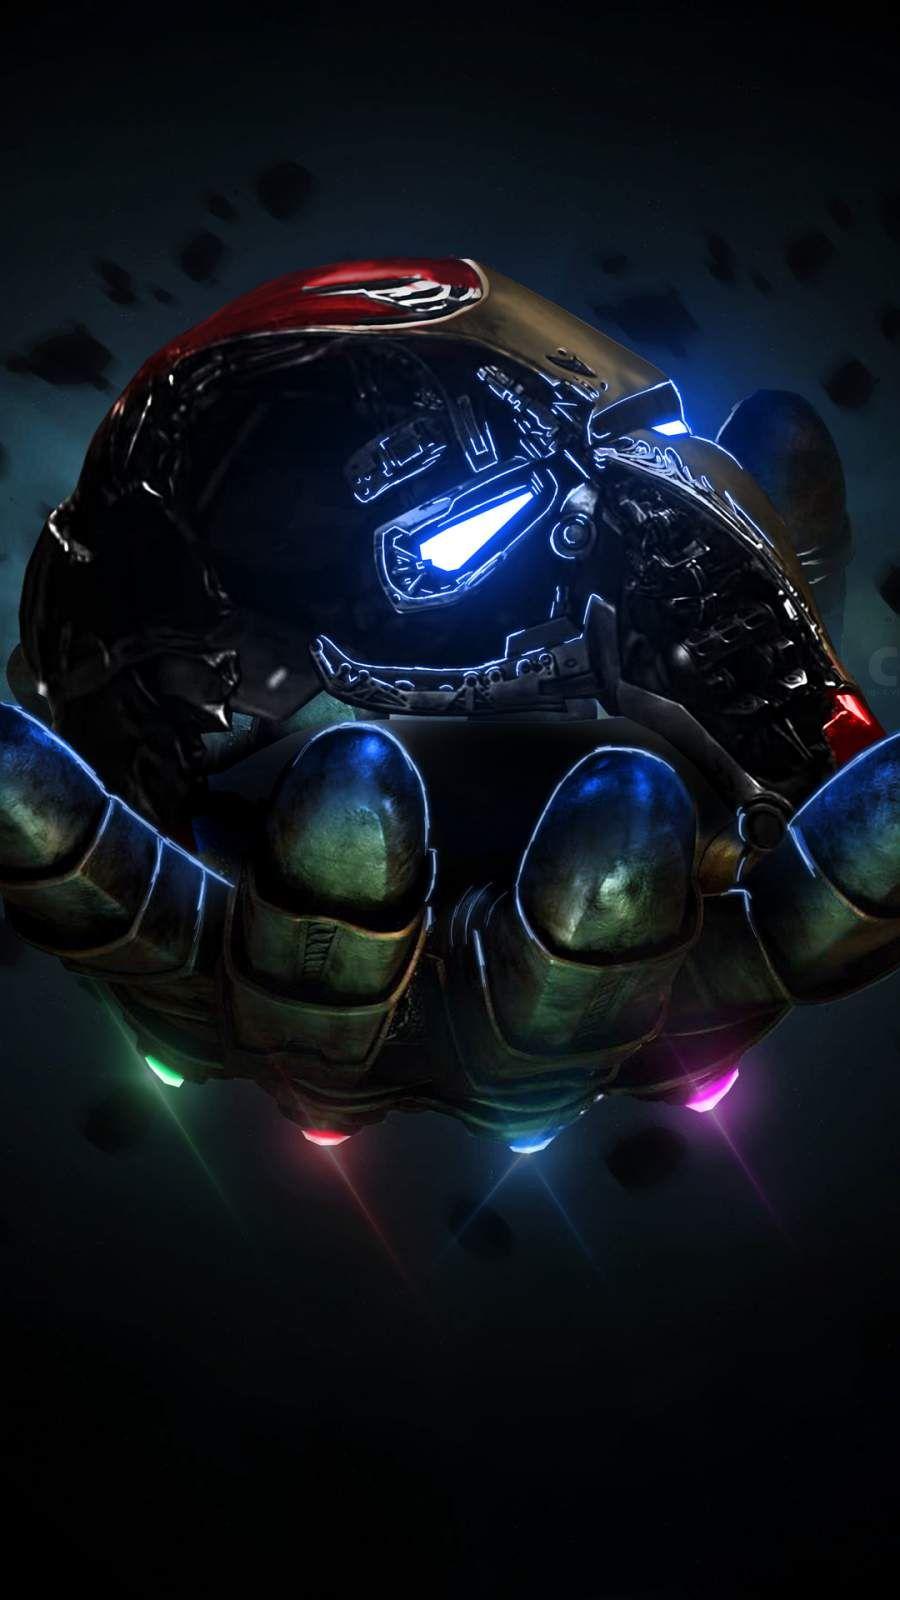 Thanos Infinity Gauntlet Holding Iron Man Mask Iphone Wallpaper Marvel Wallpaper Avengers Wallpaper Avengers